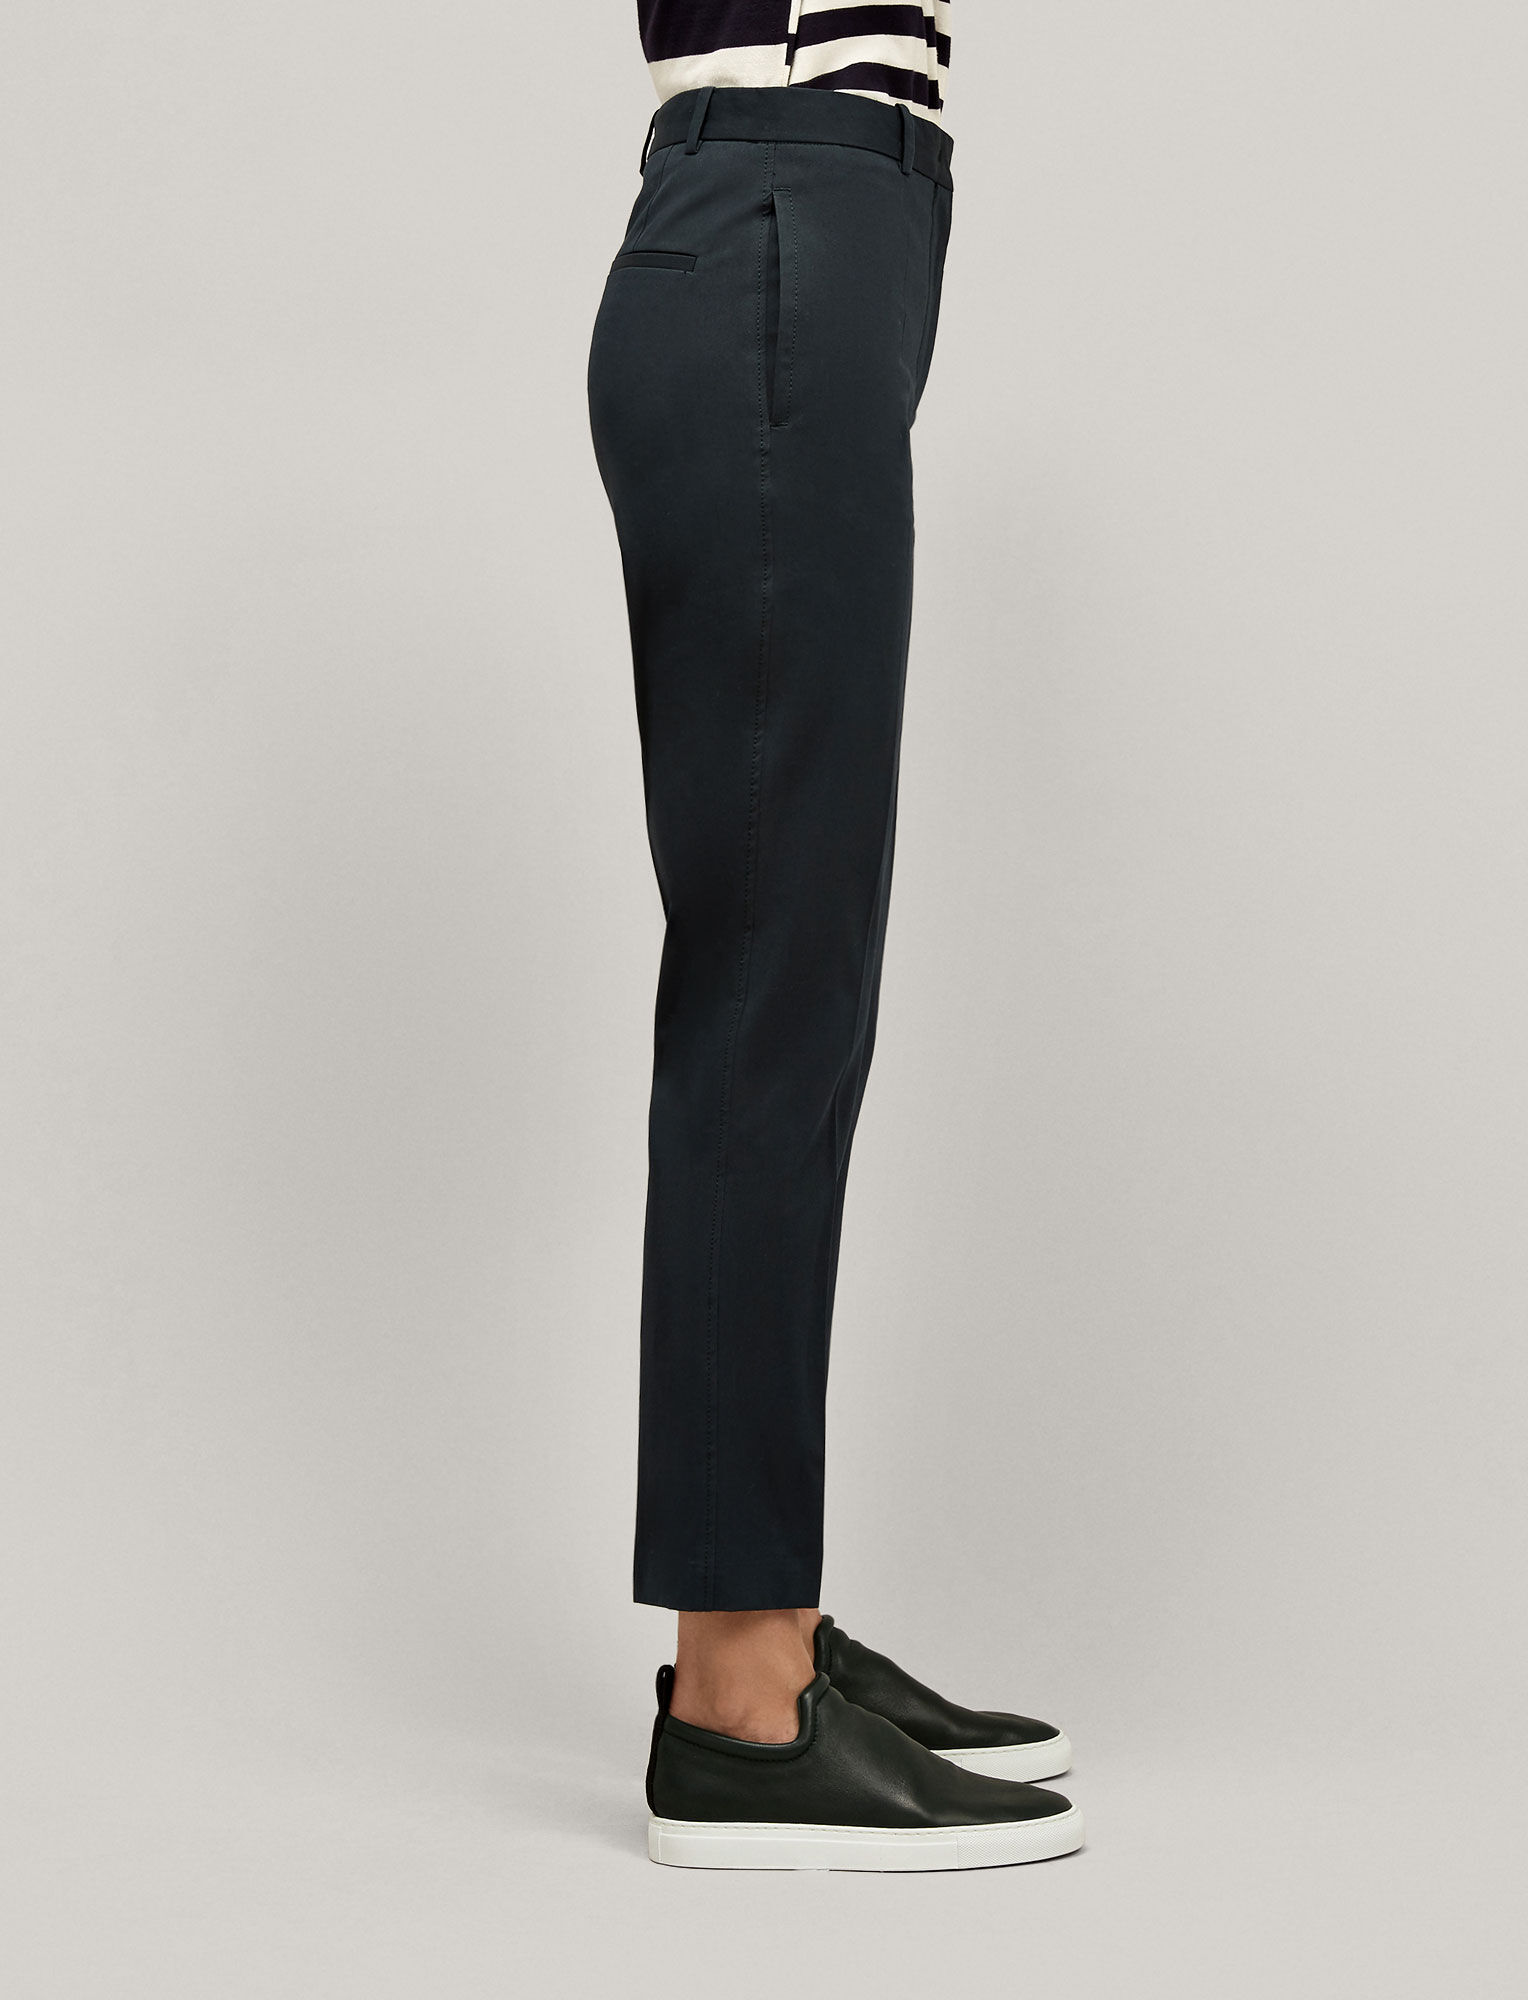 Joseph, Zoom Cotton Stretch Trousers, in BERMUDA